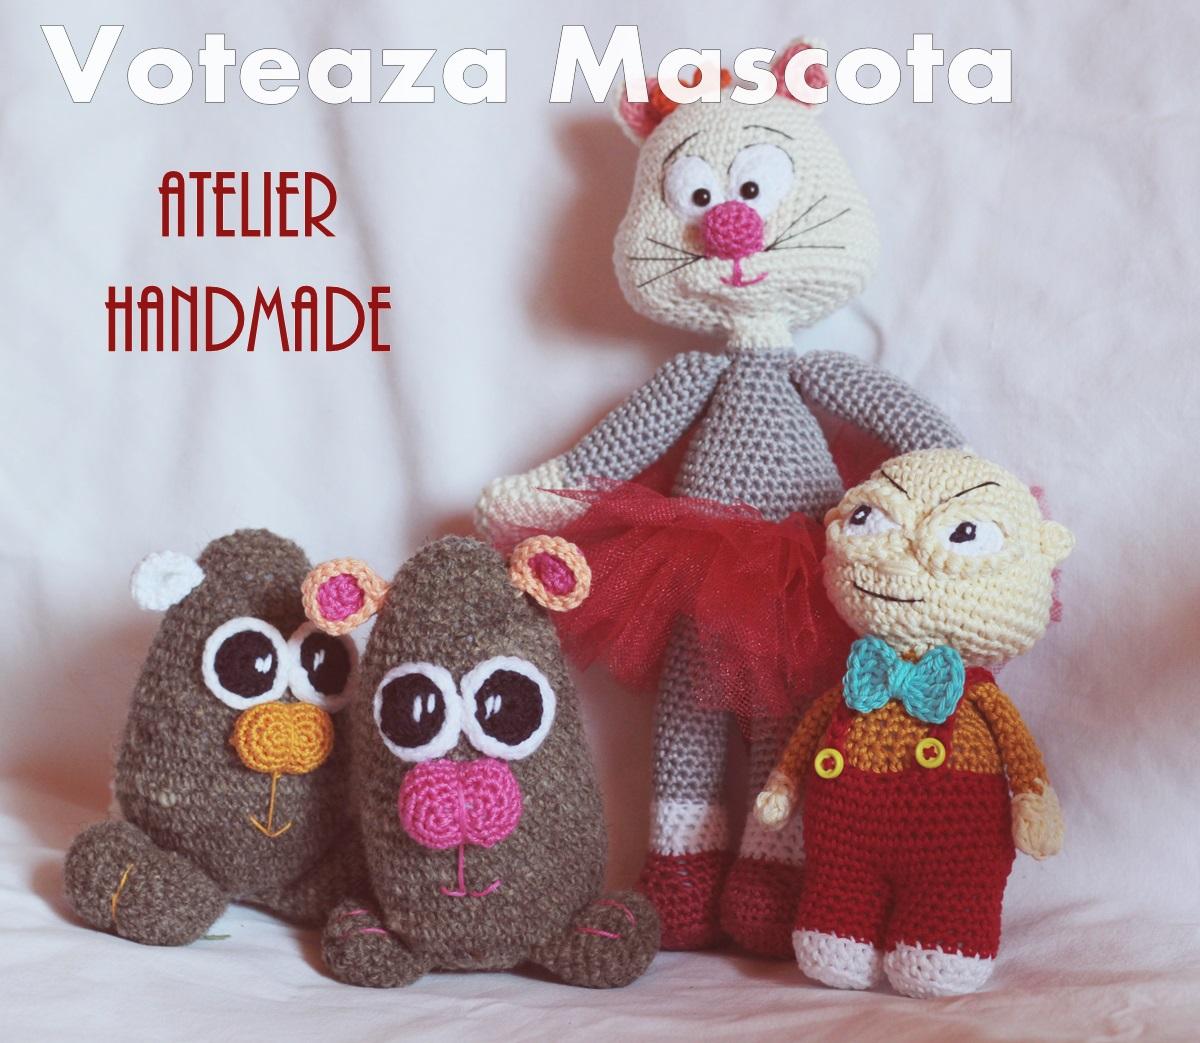 voteaza-mascota-atelier-handmade